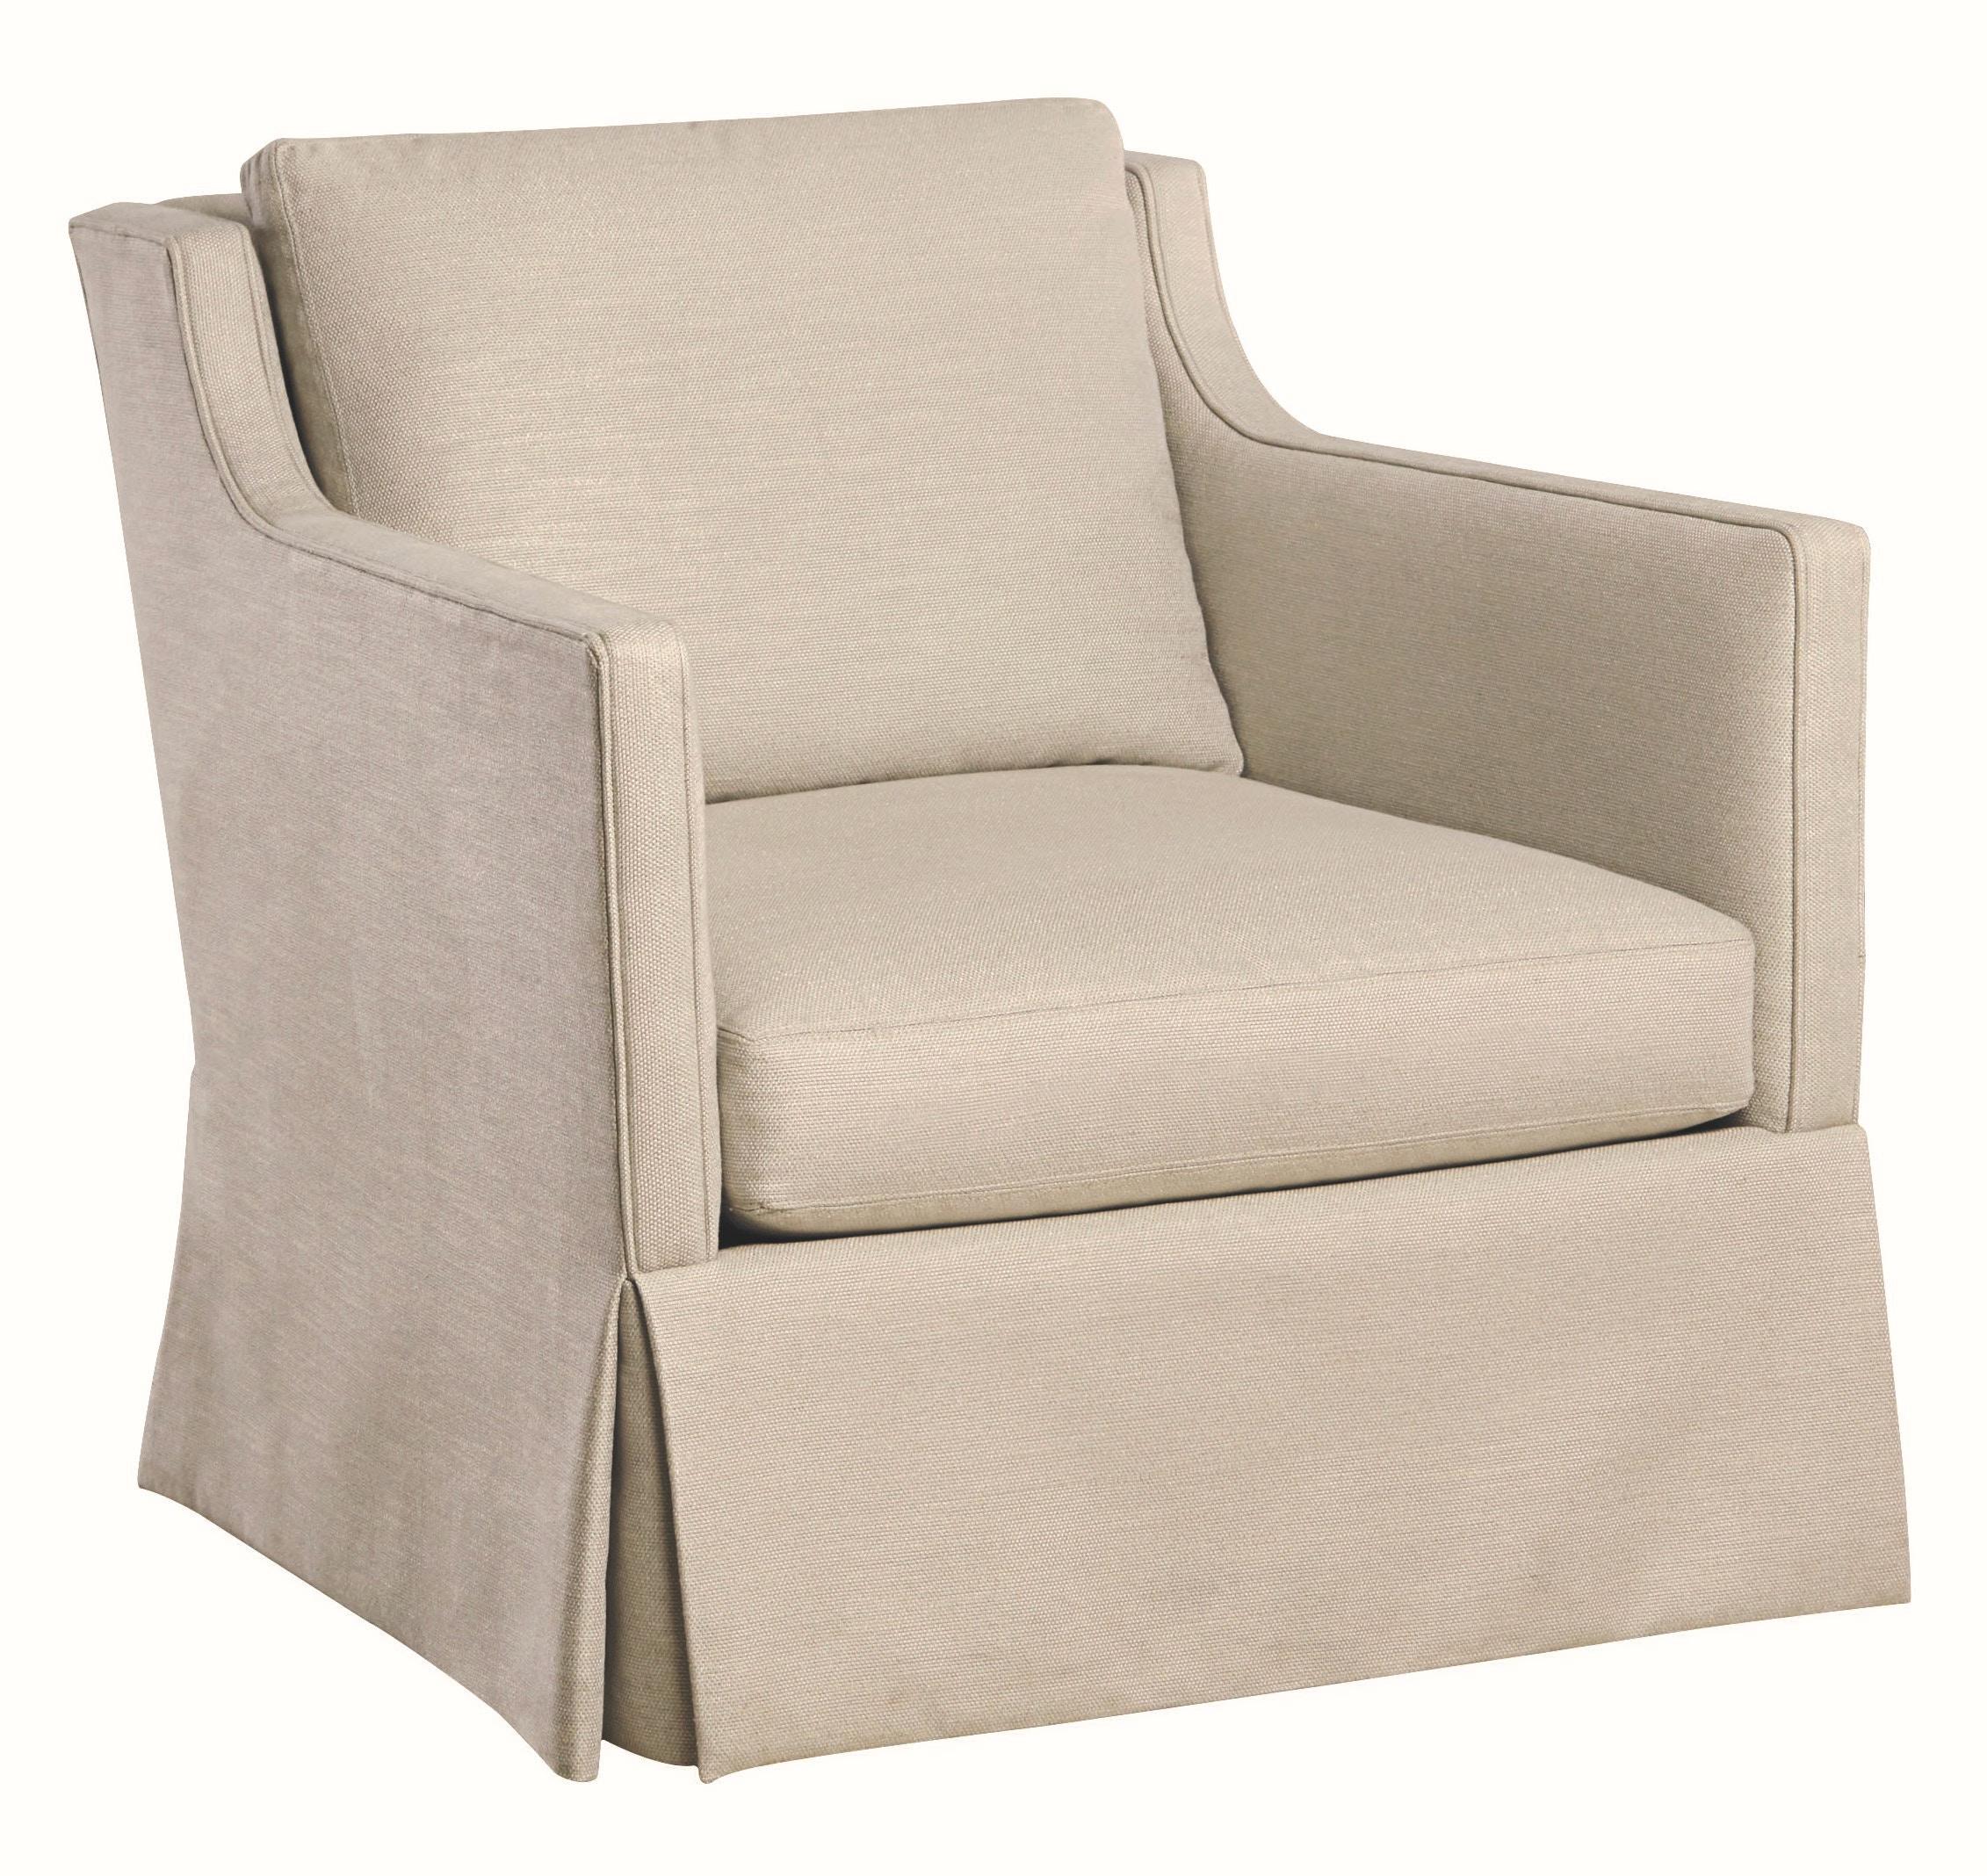 Lee Industries Swivel Chair 1401 01SW